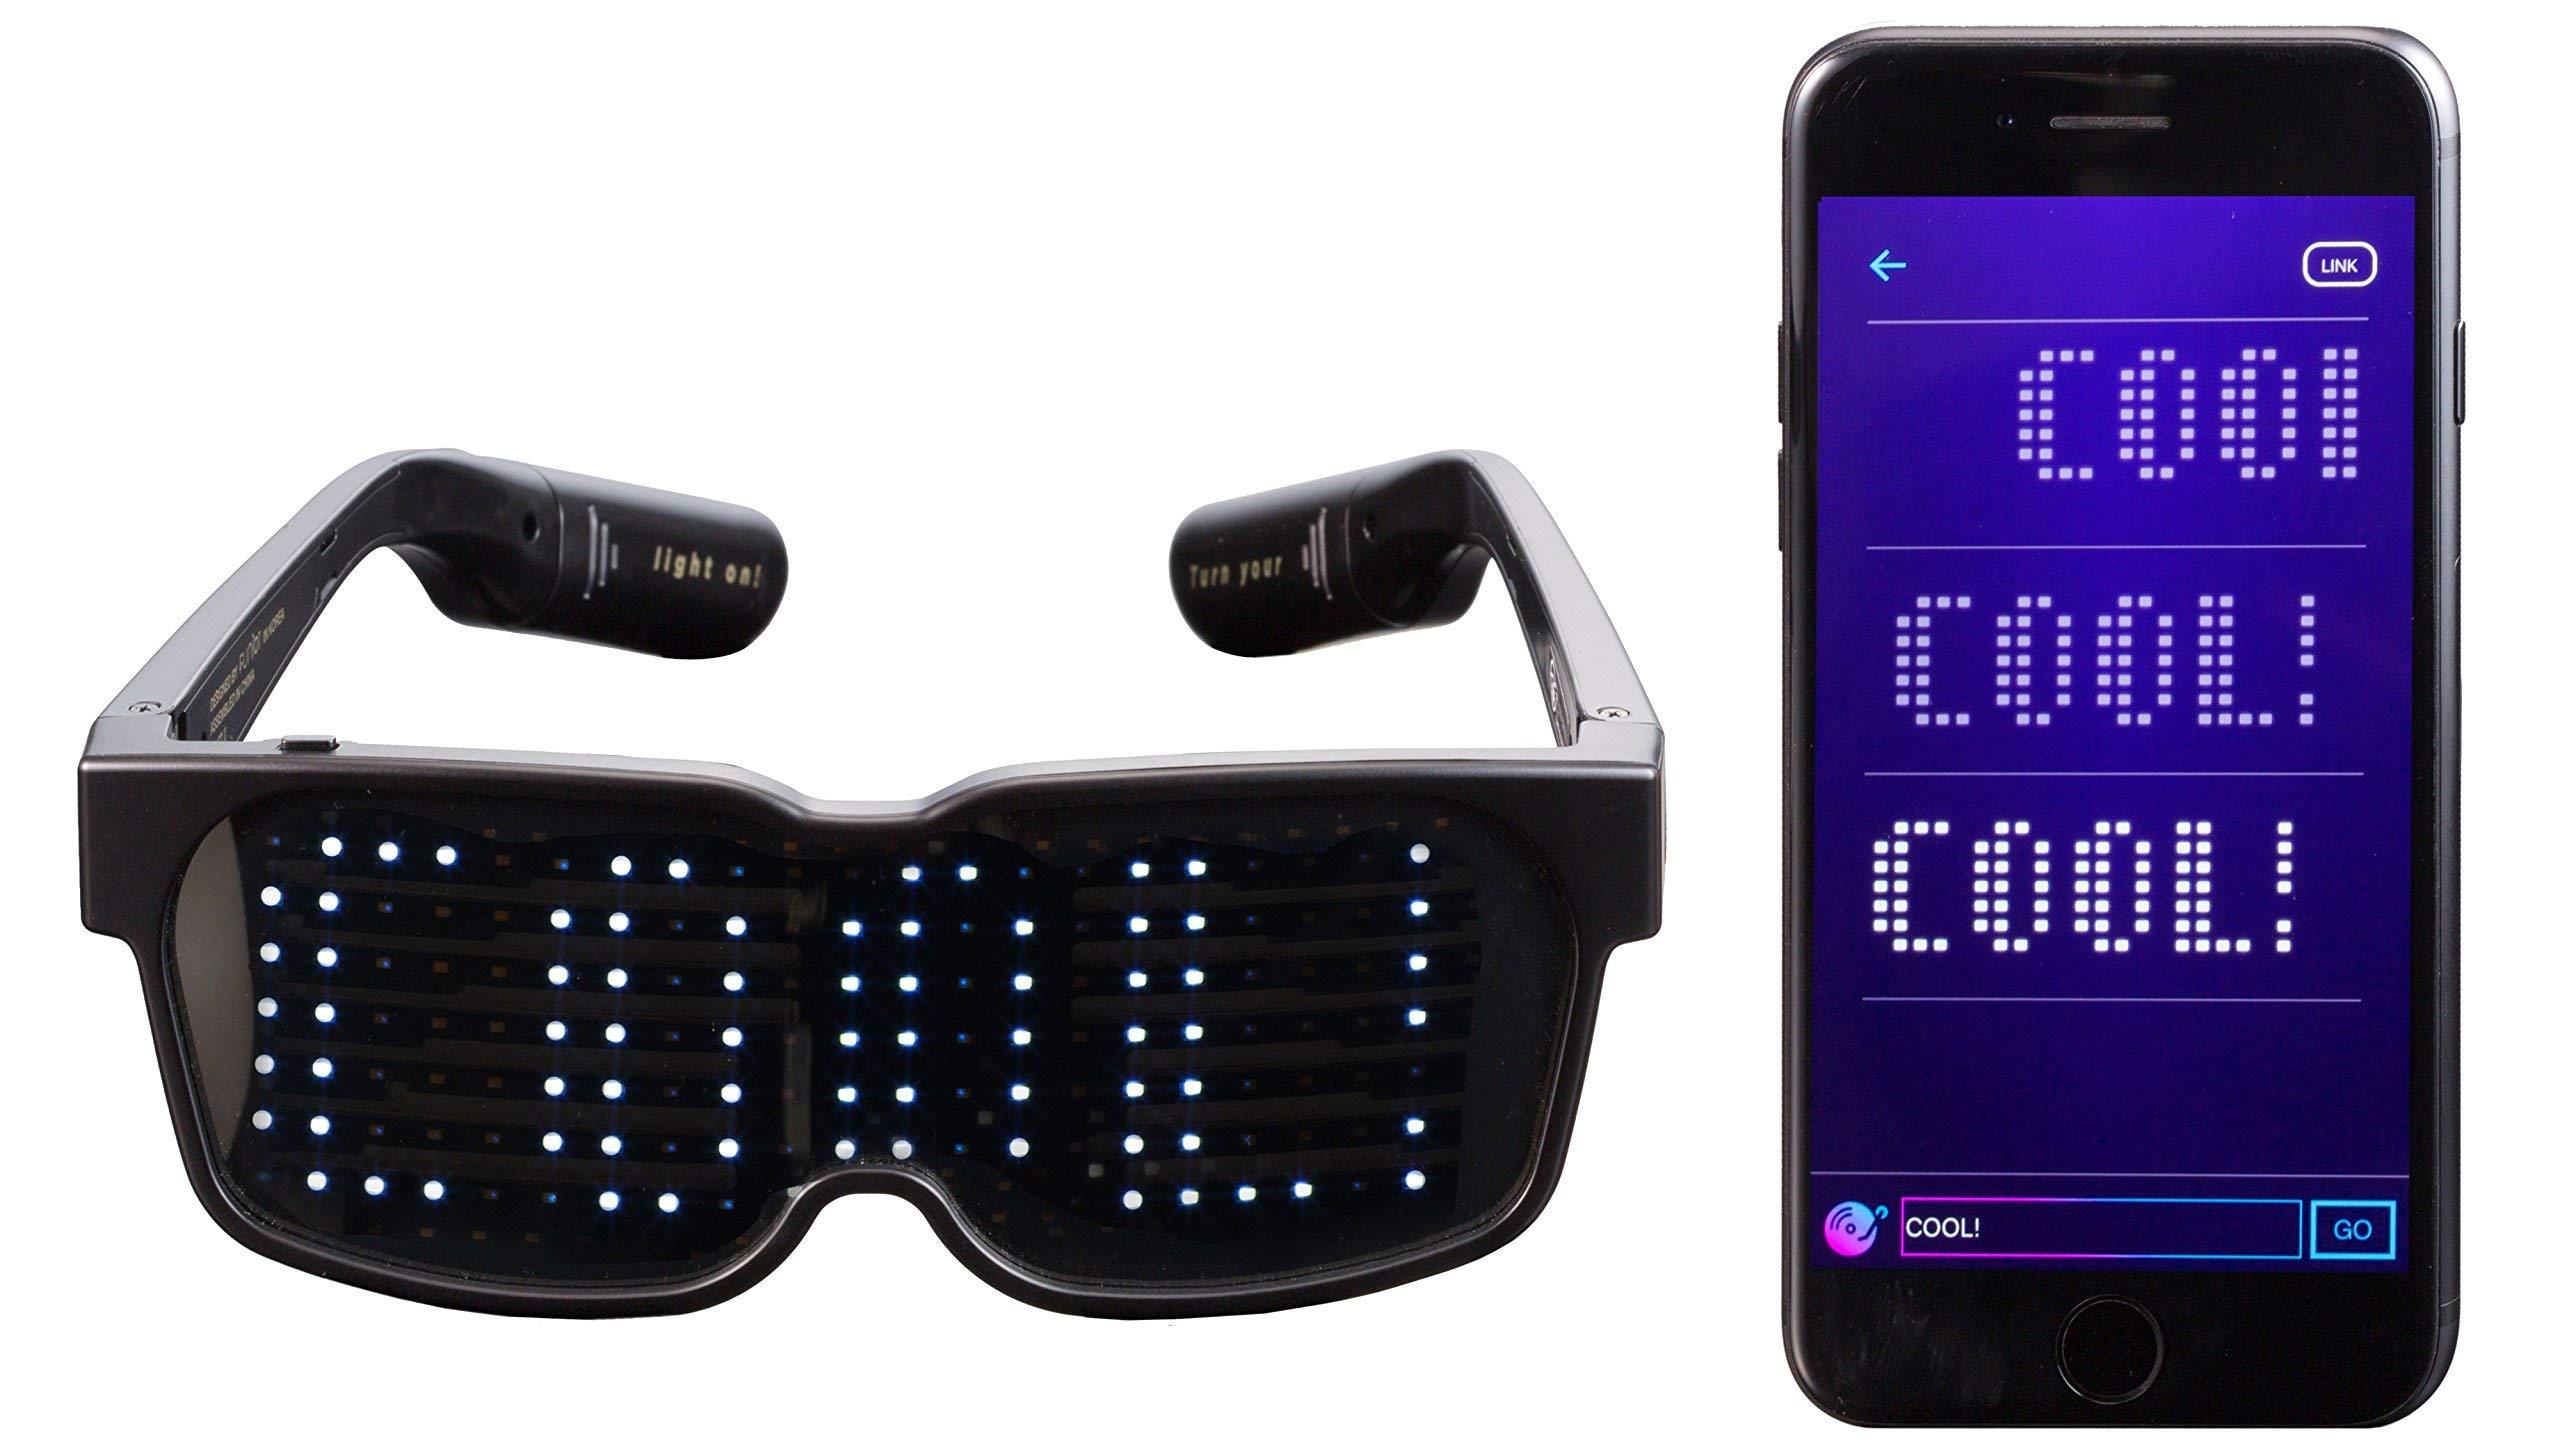 KEBEIXUAN Gafas LED Brillantes Para Fiesta Favor Gafas Bluetooth Personalizables con Flash LED LED Recargable Gafas Luminosas para Raves,Festivales de M/úsica, Cuatro colores